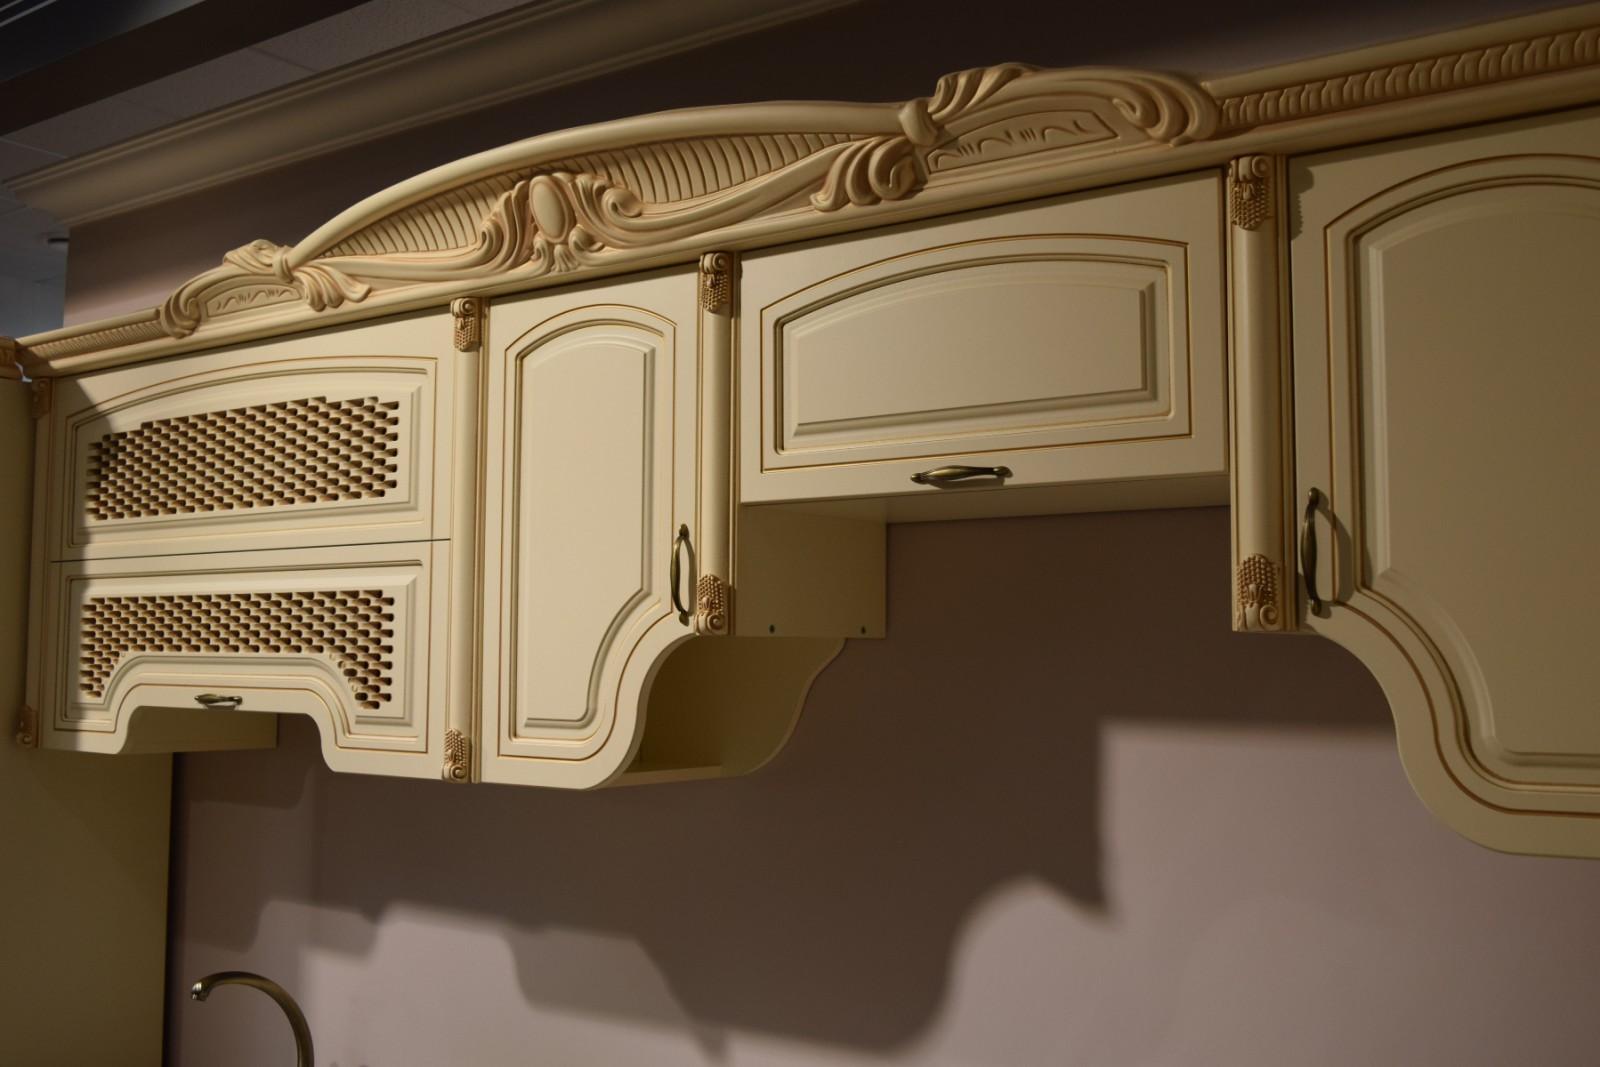 Кухня угловая Мадлен, крем - фото